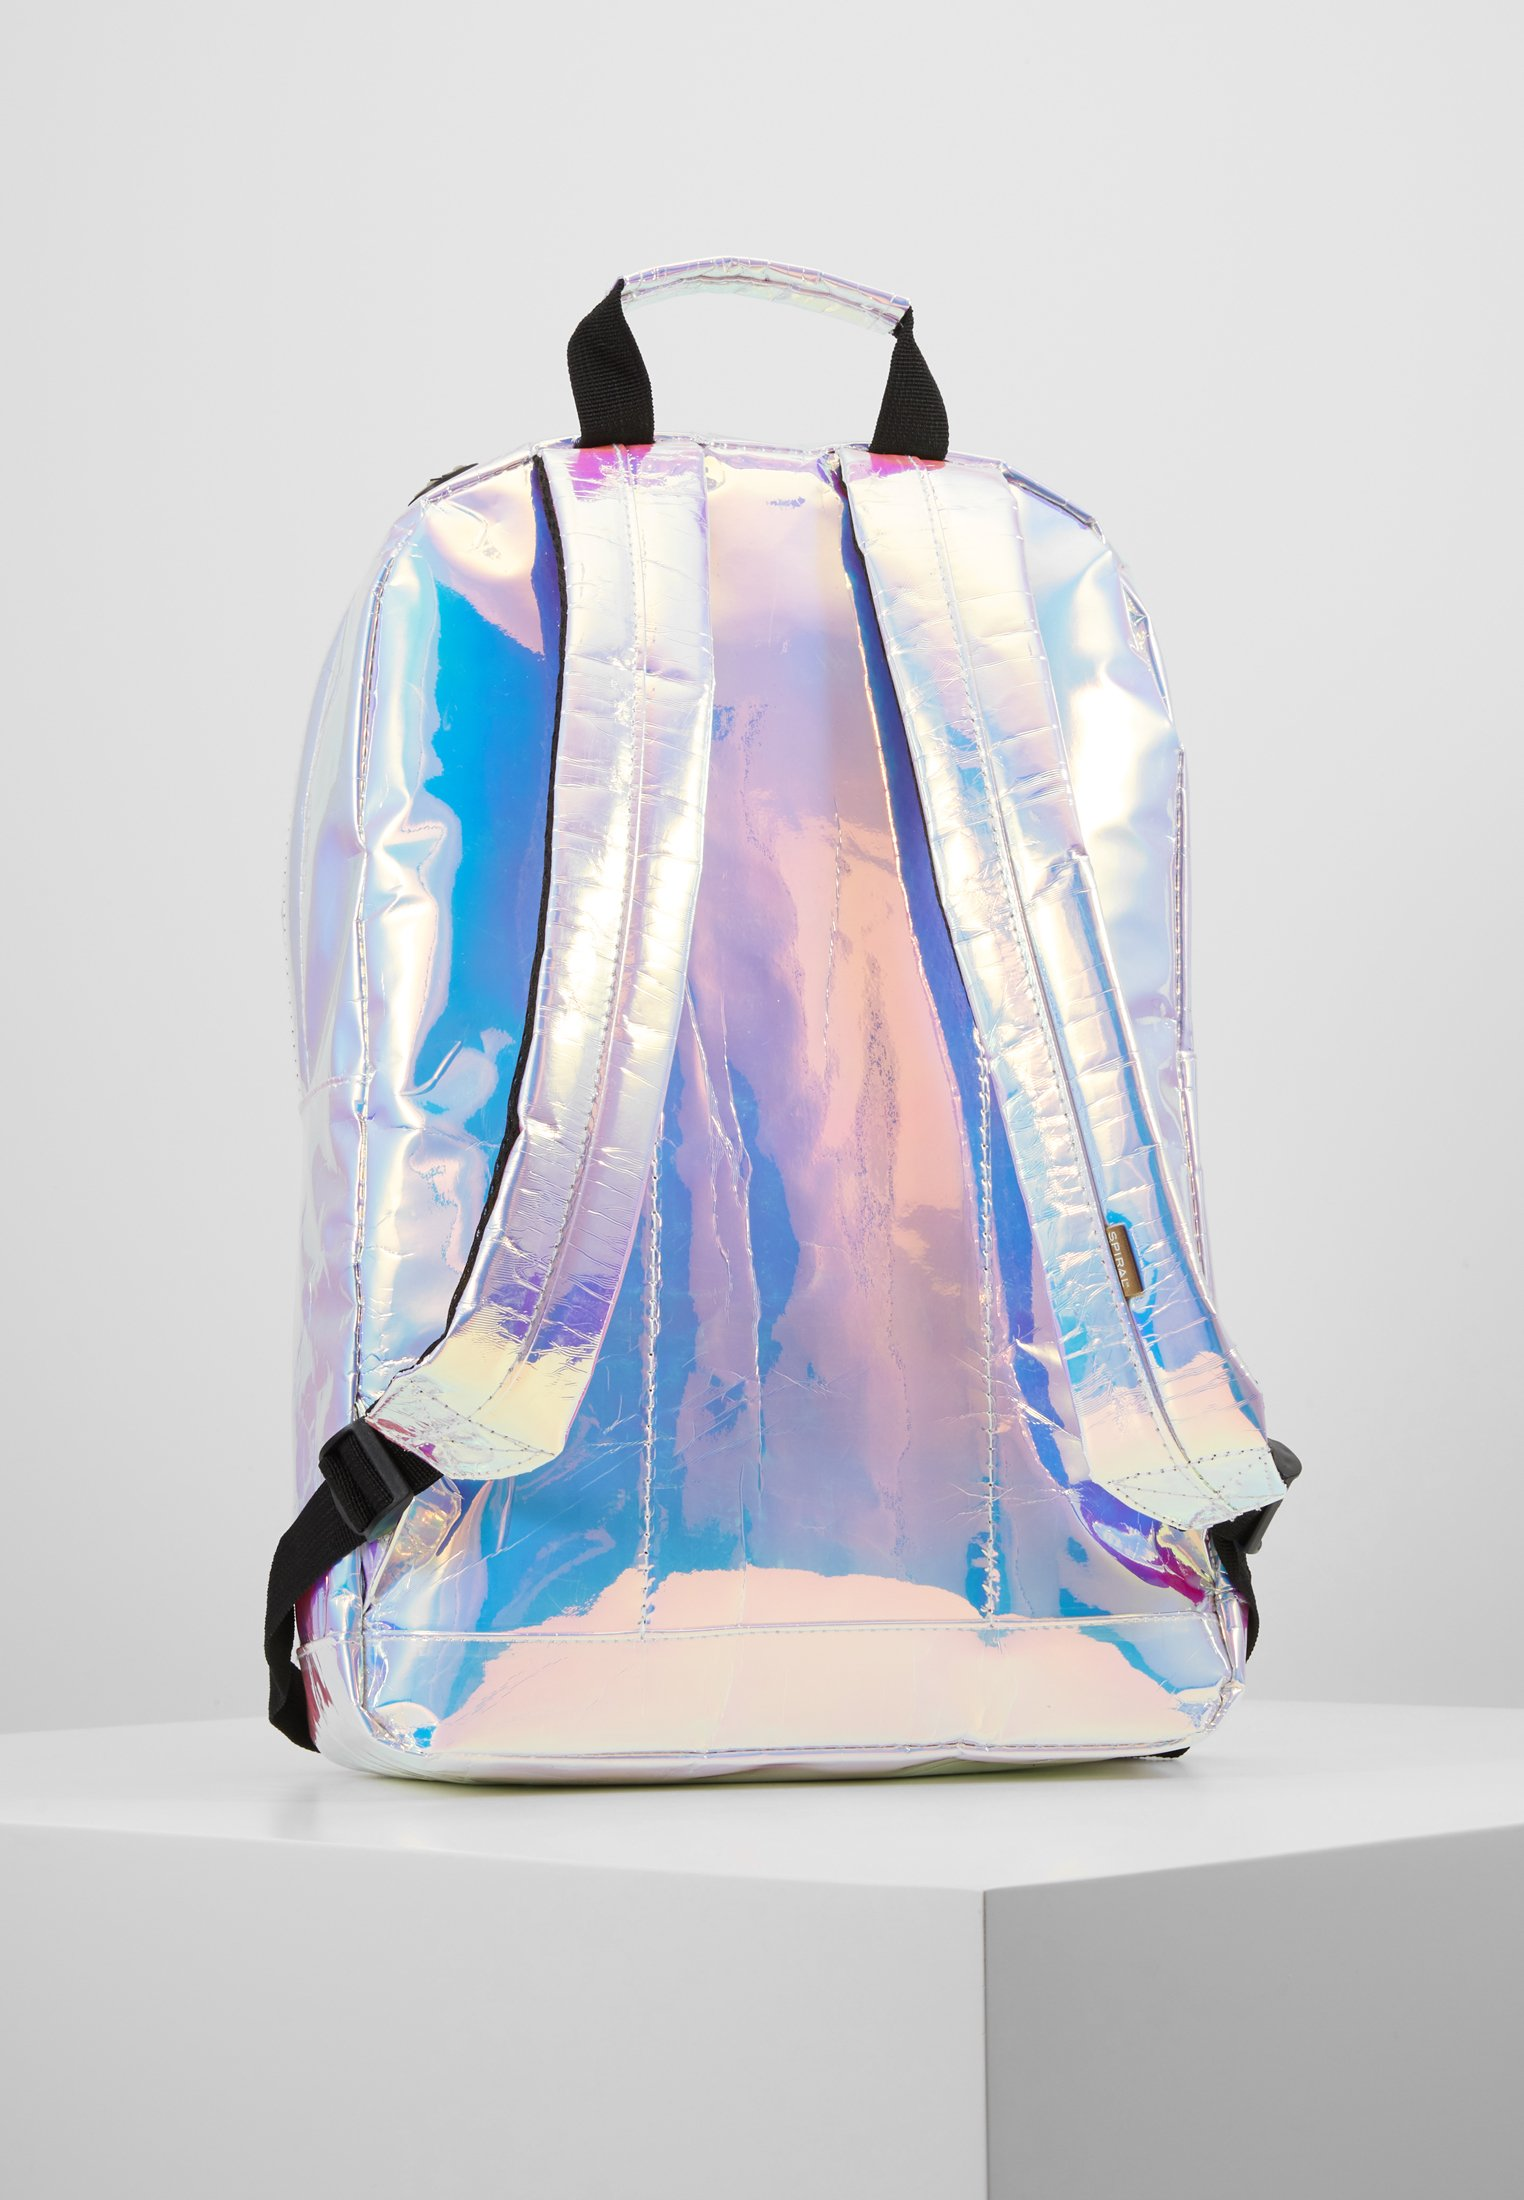 Spiral Bags Ryggsekk - holographic/sølv LEtIekSJhaUWtQ7